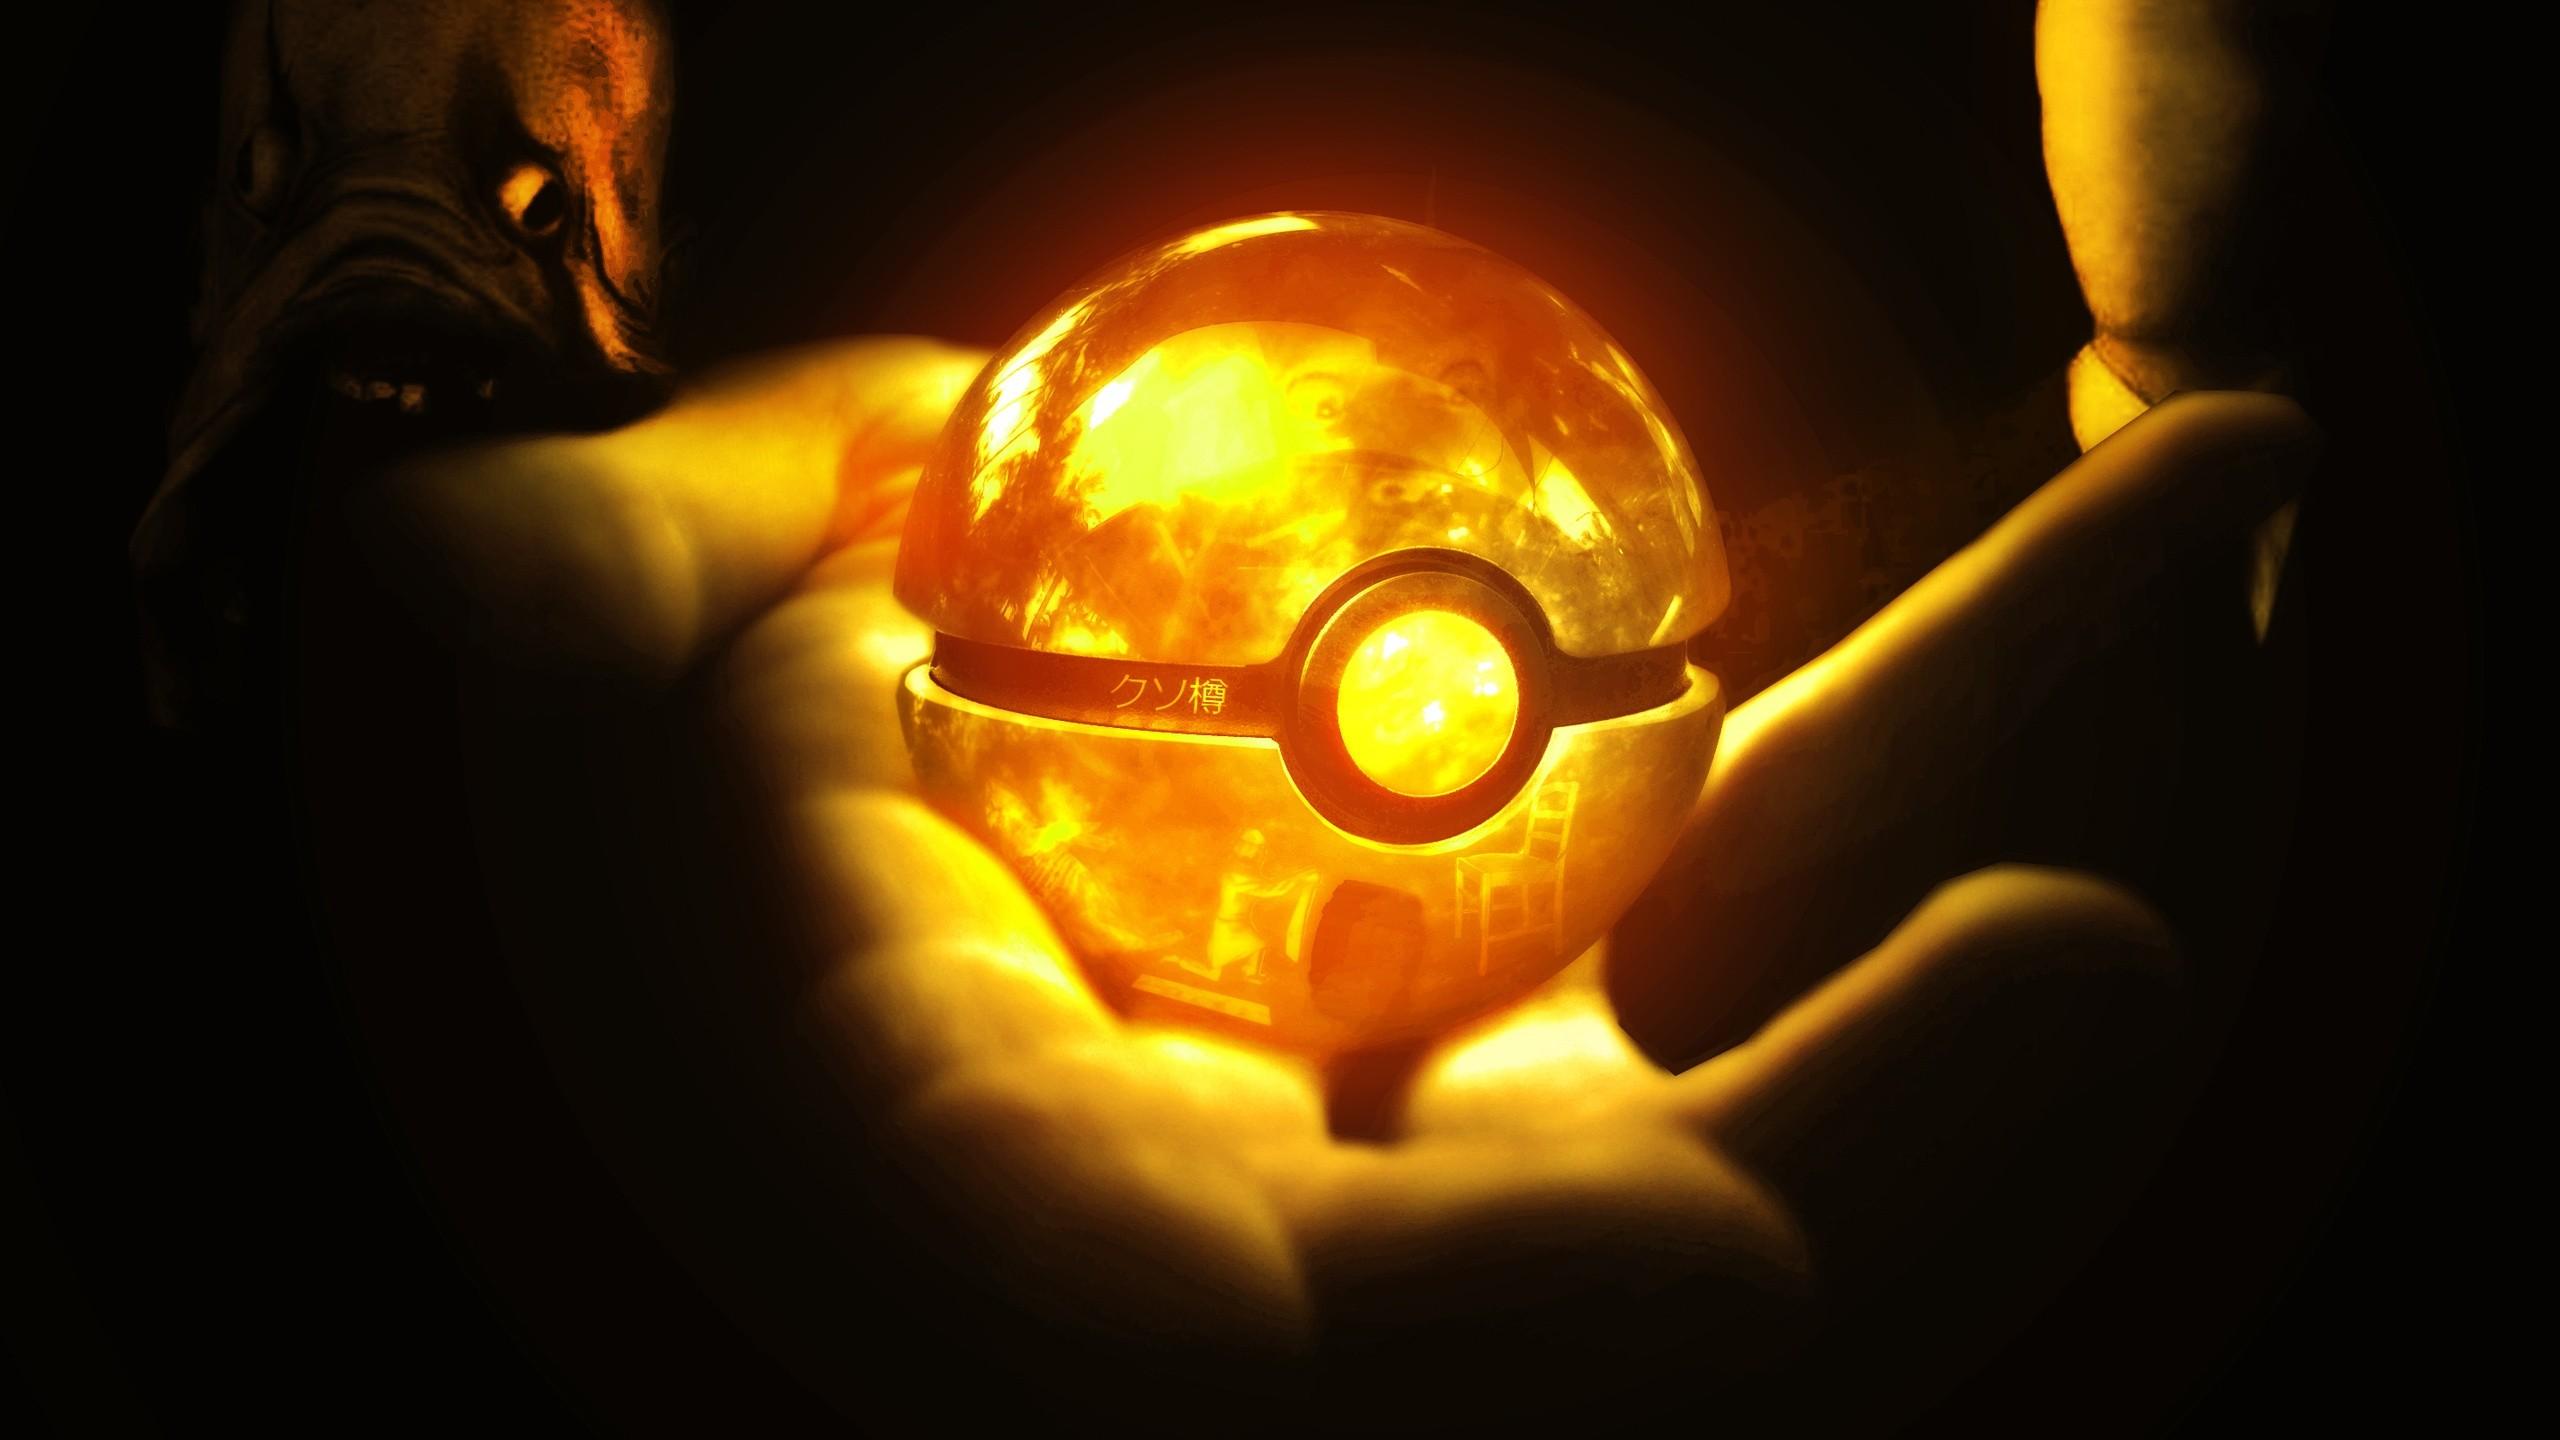 Glowing Pokeball iPhone Wallpaper – Wish I had one!